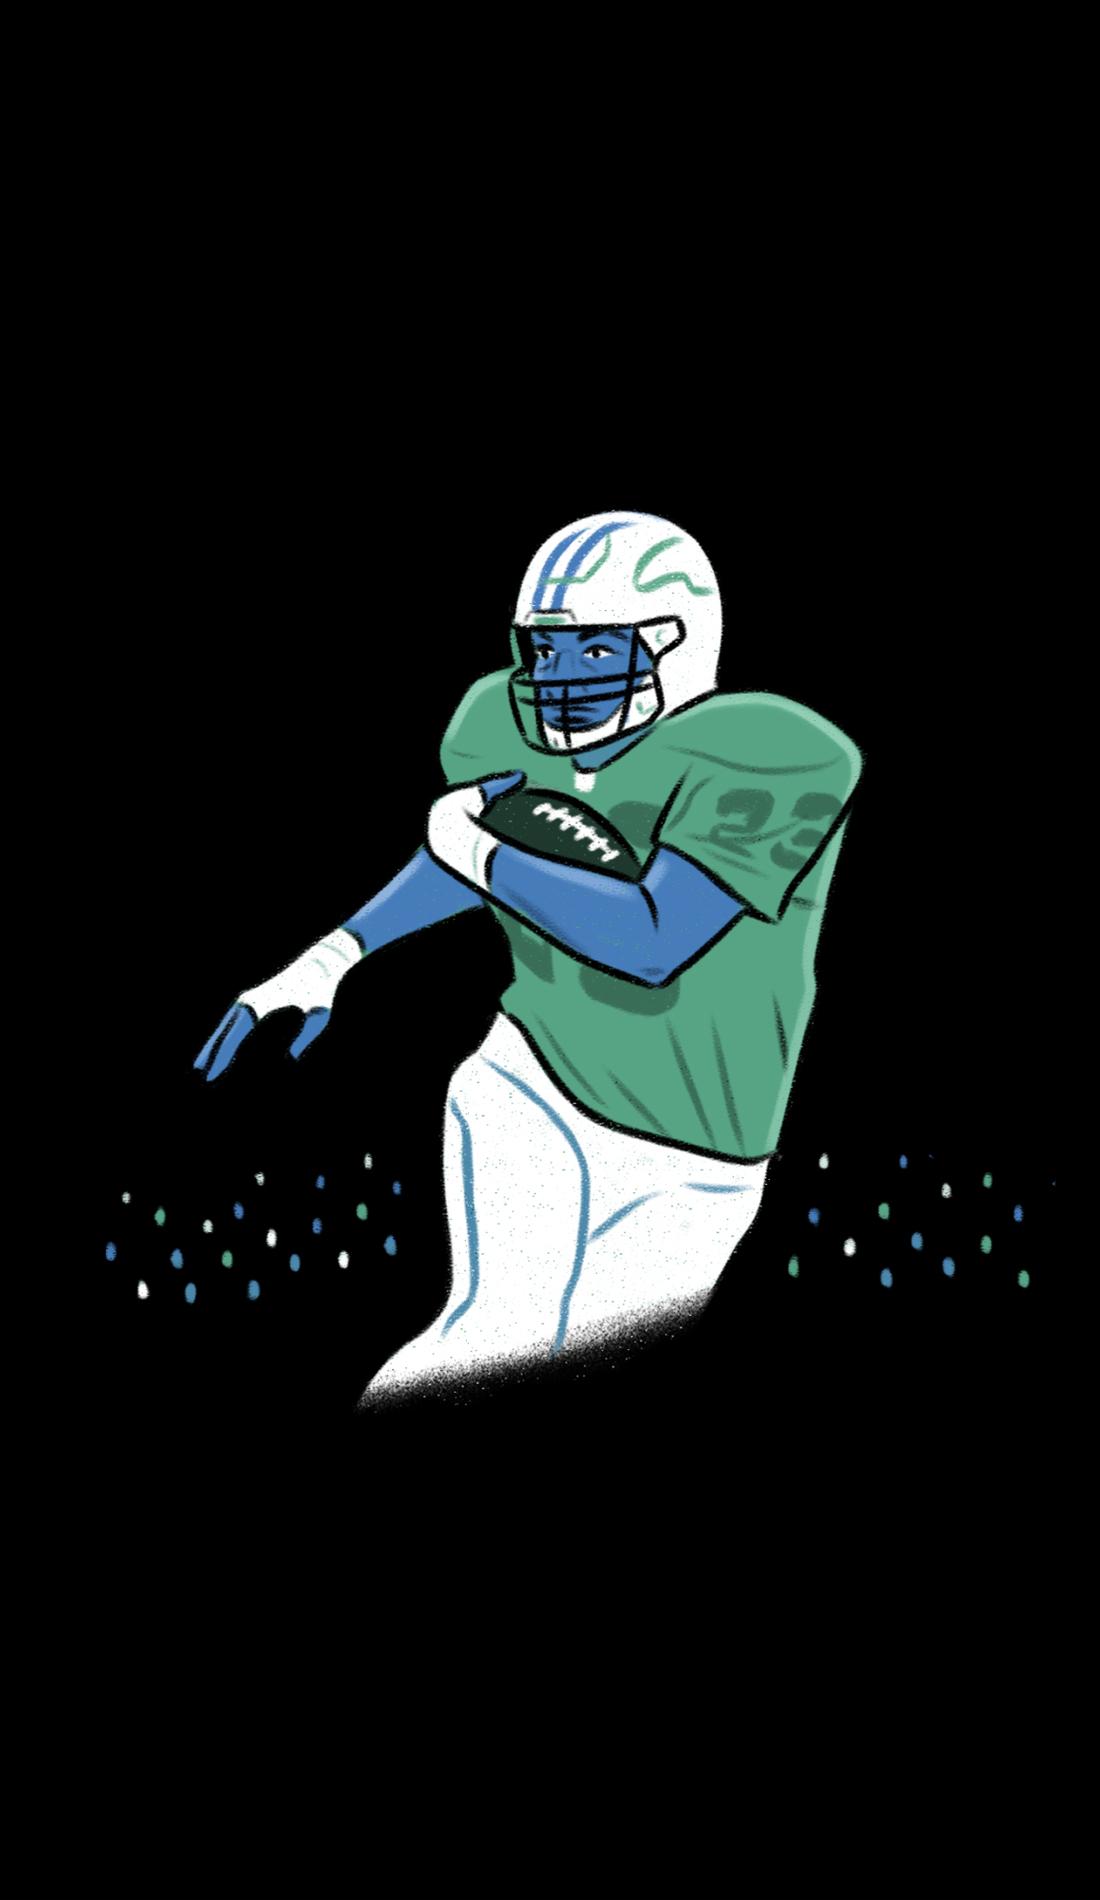 A South Carolina State Bulldogs Football live event